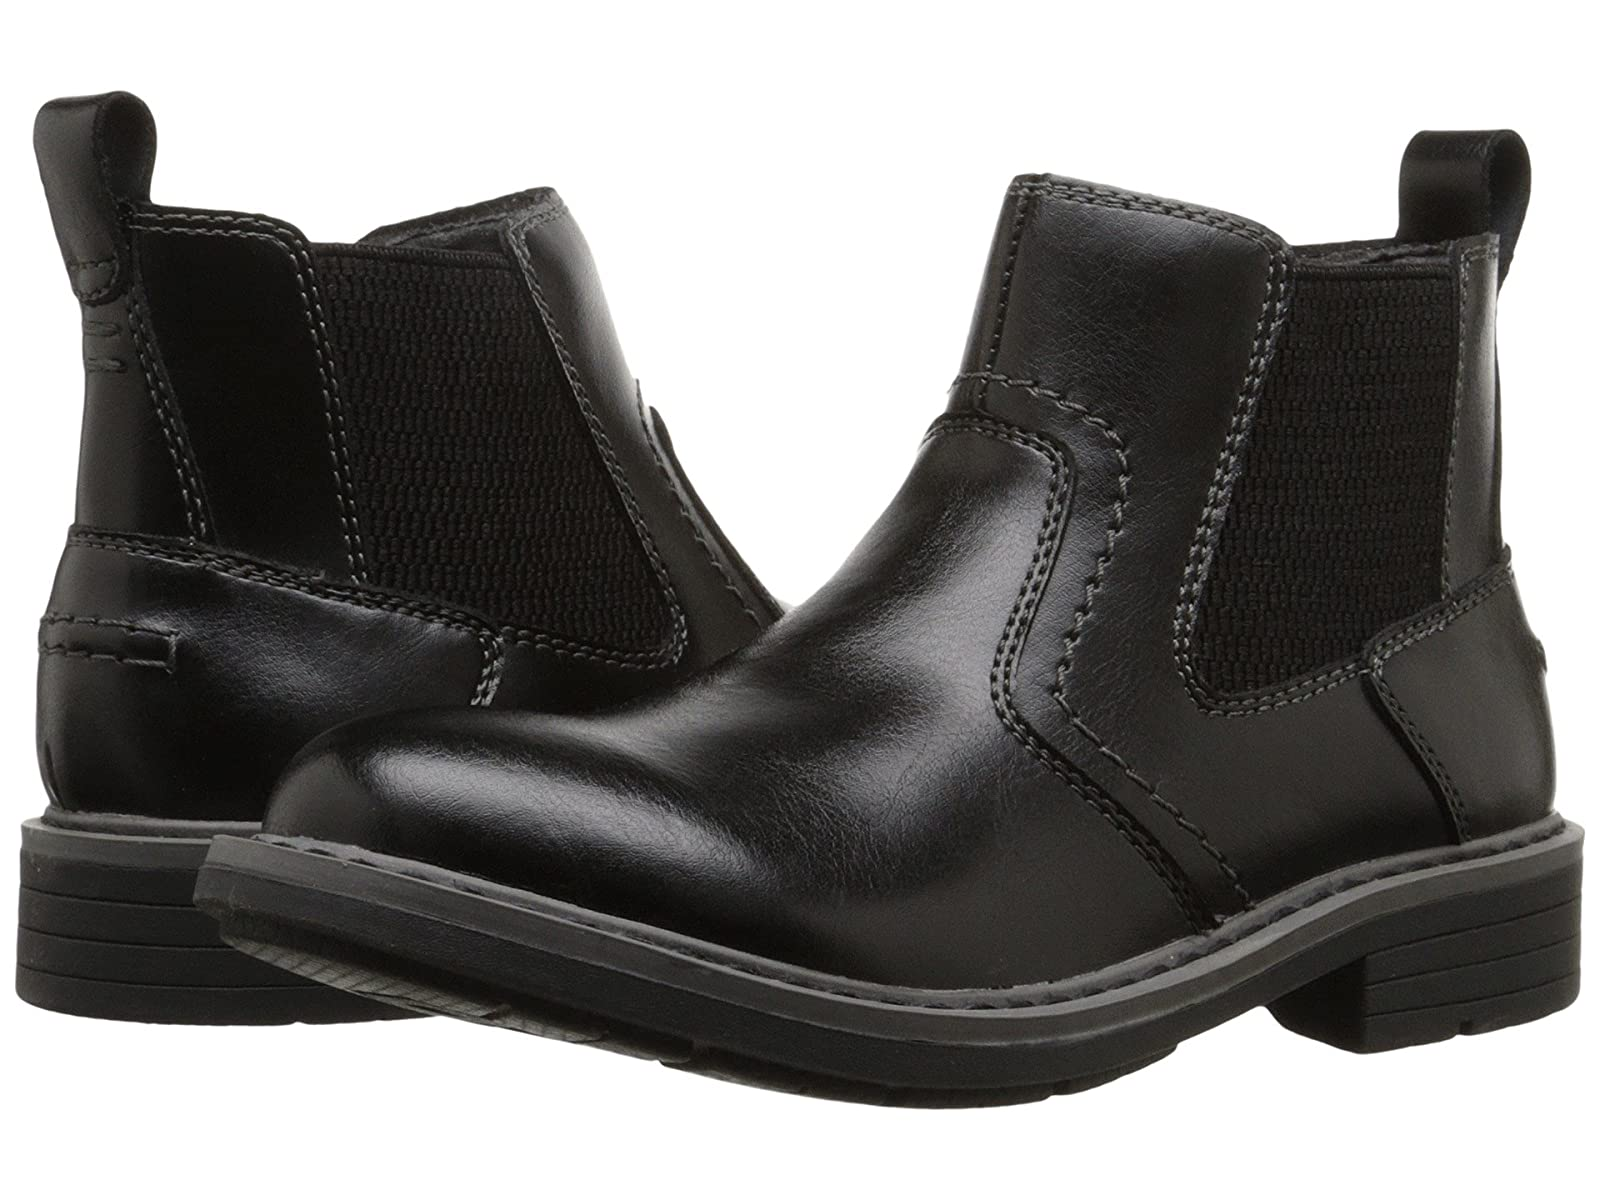 Florsheim Kids Studio Gore Boot Jr. (Toddler/Little Kid/Big Kid)Affordable and distinctive shoes